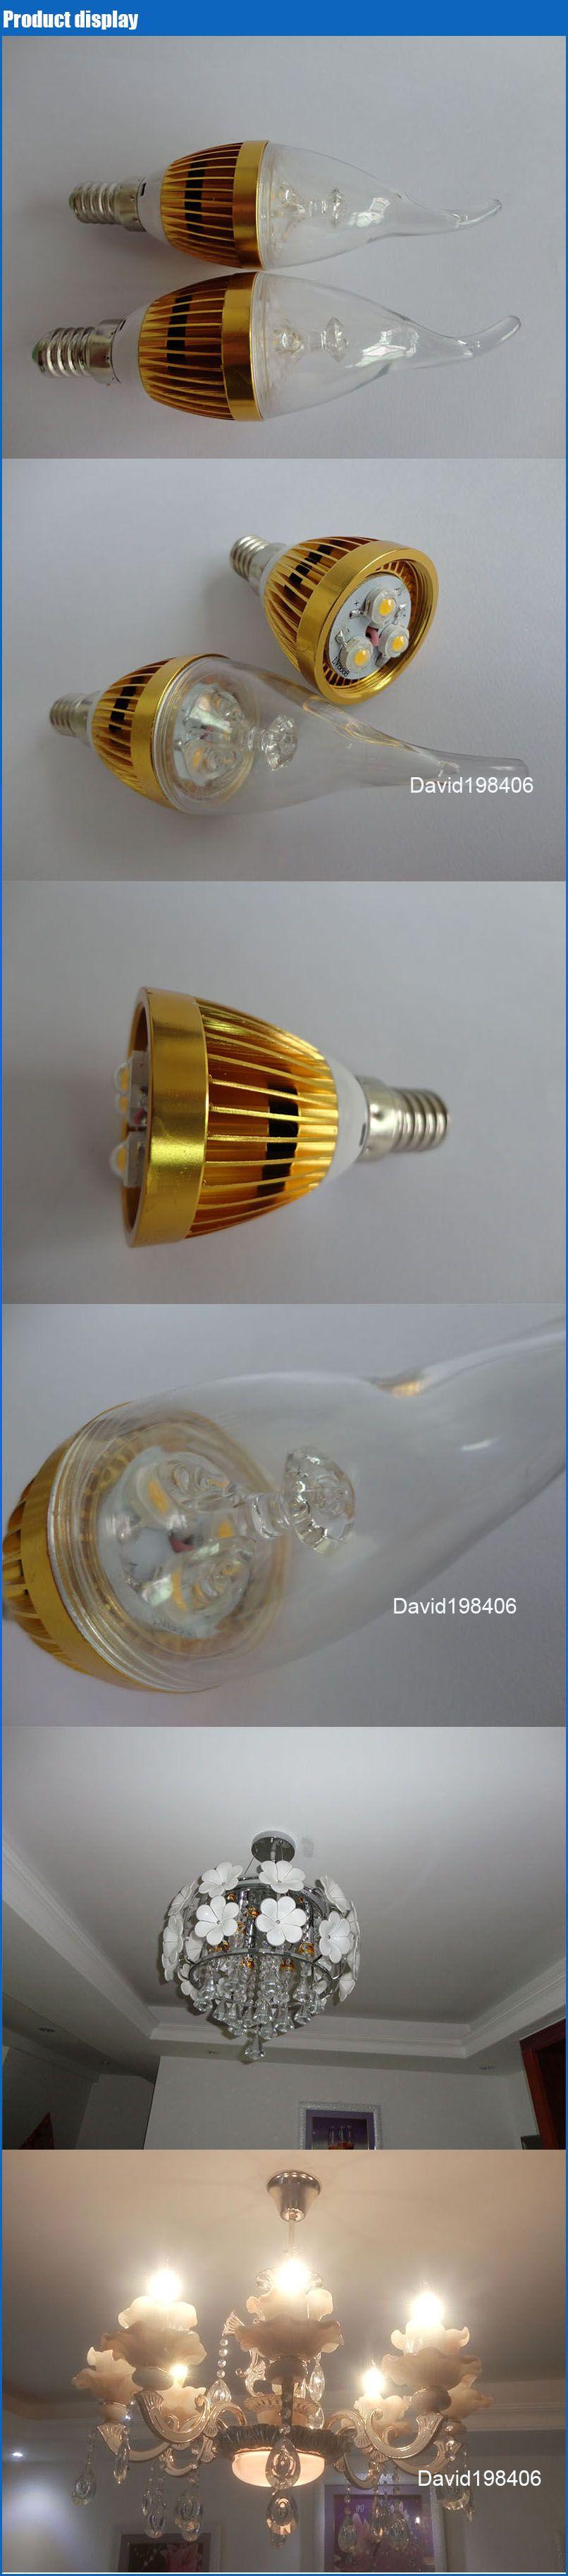 rBVaI1ipWliAdEQ4AATUiP3uw78139 Stilvolle Led Lampen 20 Watt Dekorationen